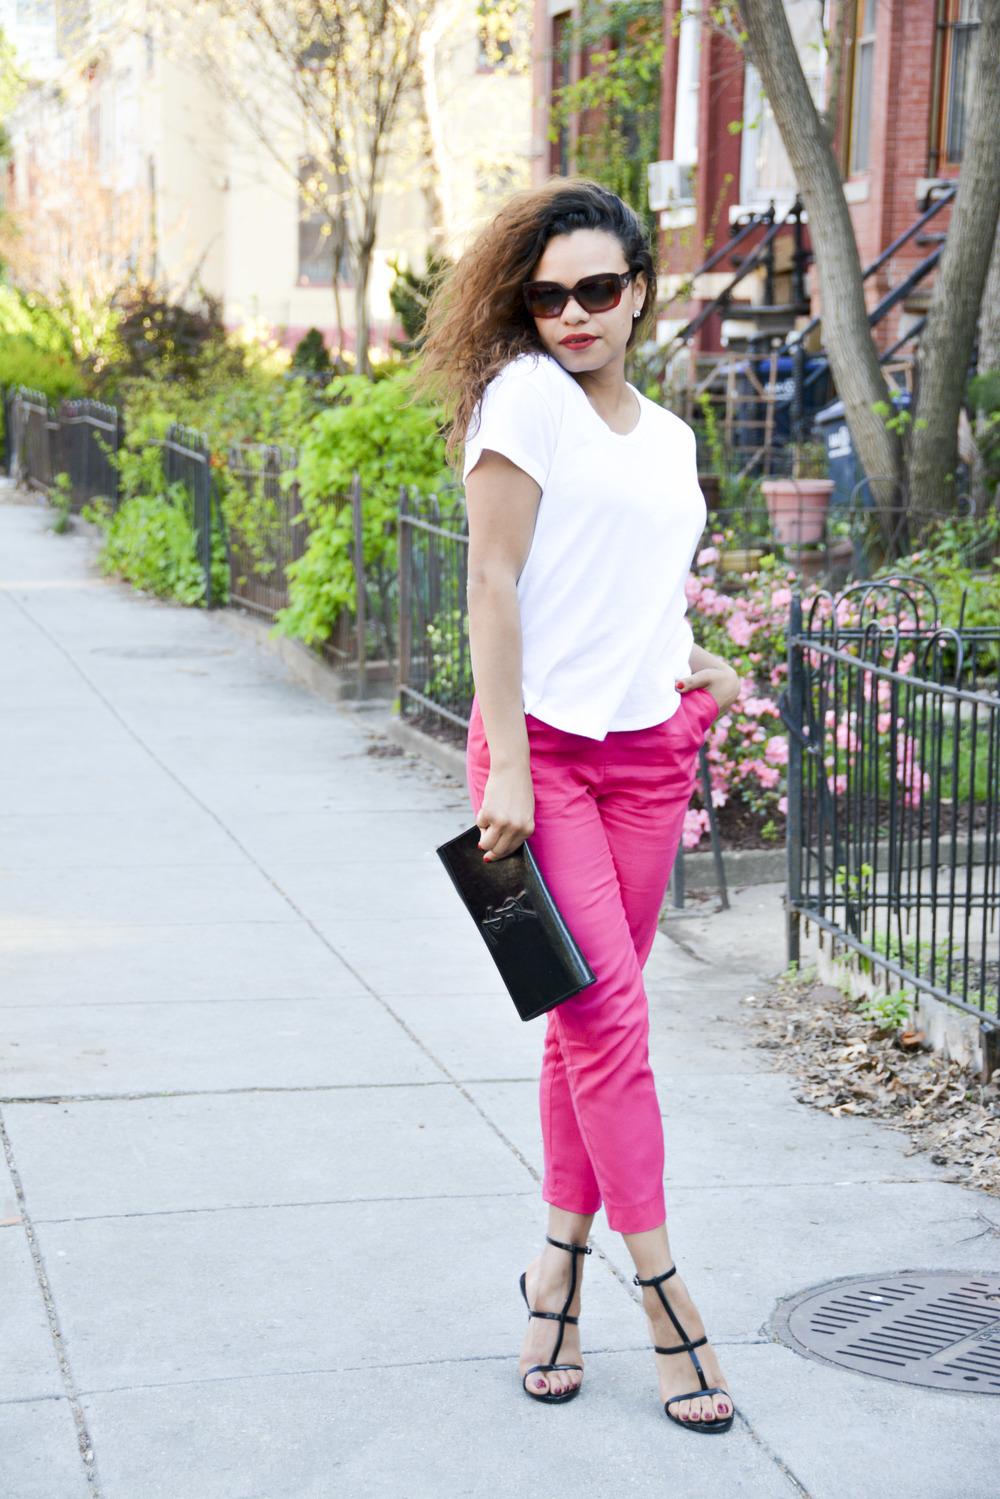 wearing: H&M Trousers, Zara top, Forever21 shoes, YSL clutch, Prada sunnies